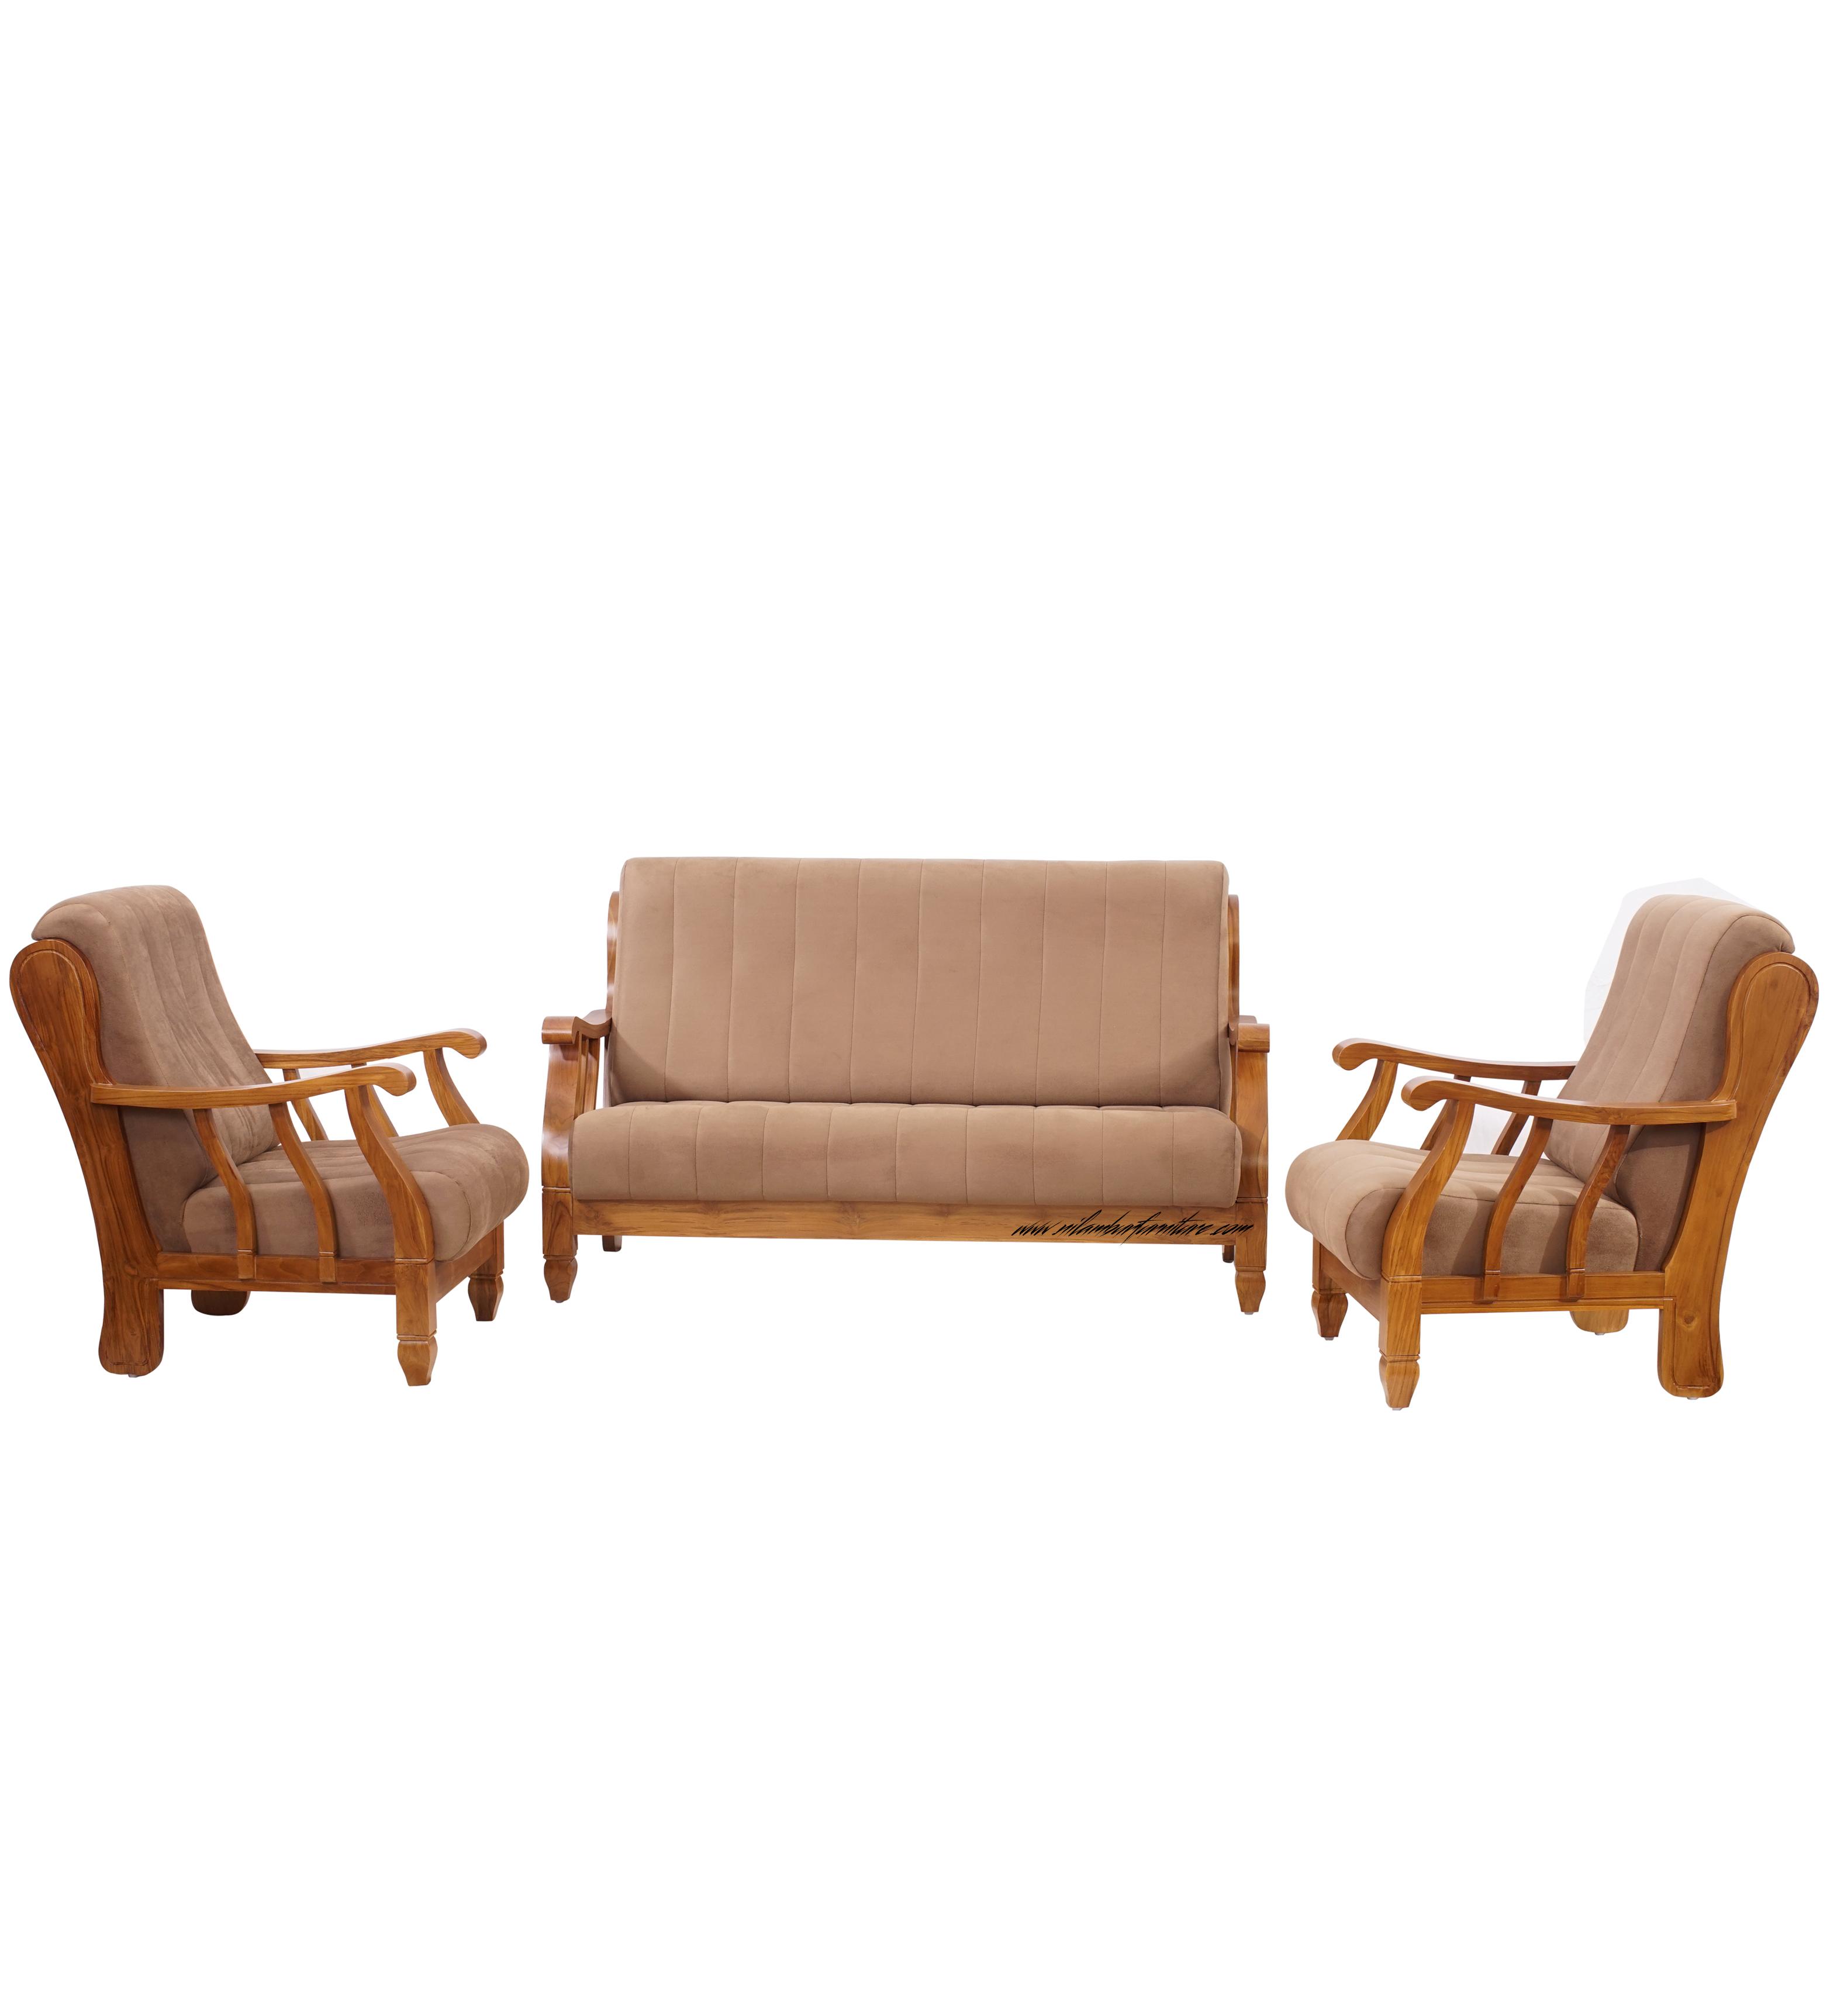 Caramel Teak Wood Sofa Set 311 Buy Teak Wood Sofa Set Designs Wooden Sofa Set Teak Wood Carving Sofa Sets Product On Alibaba Com